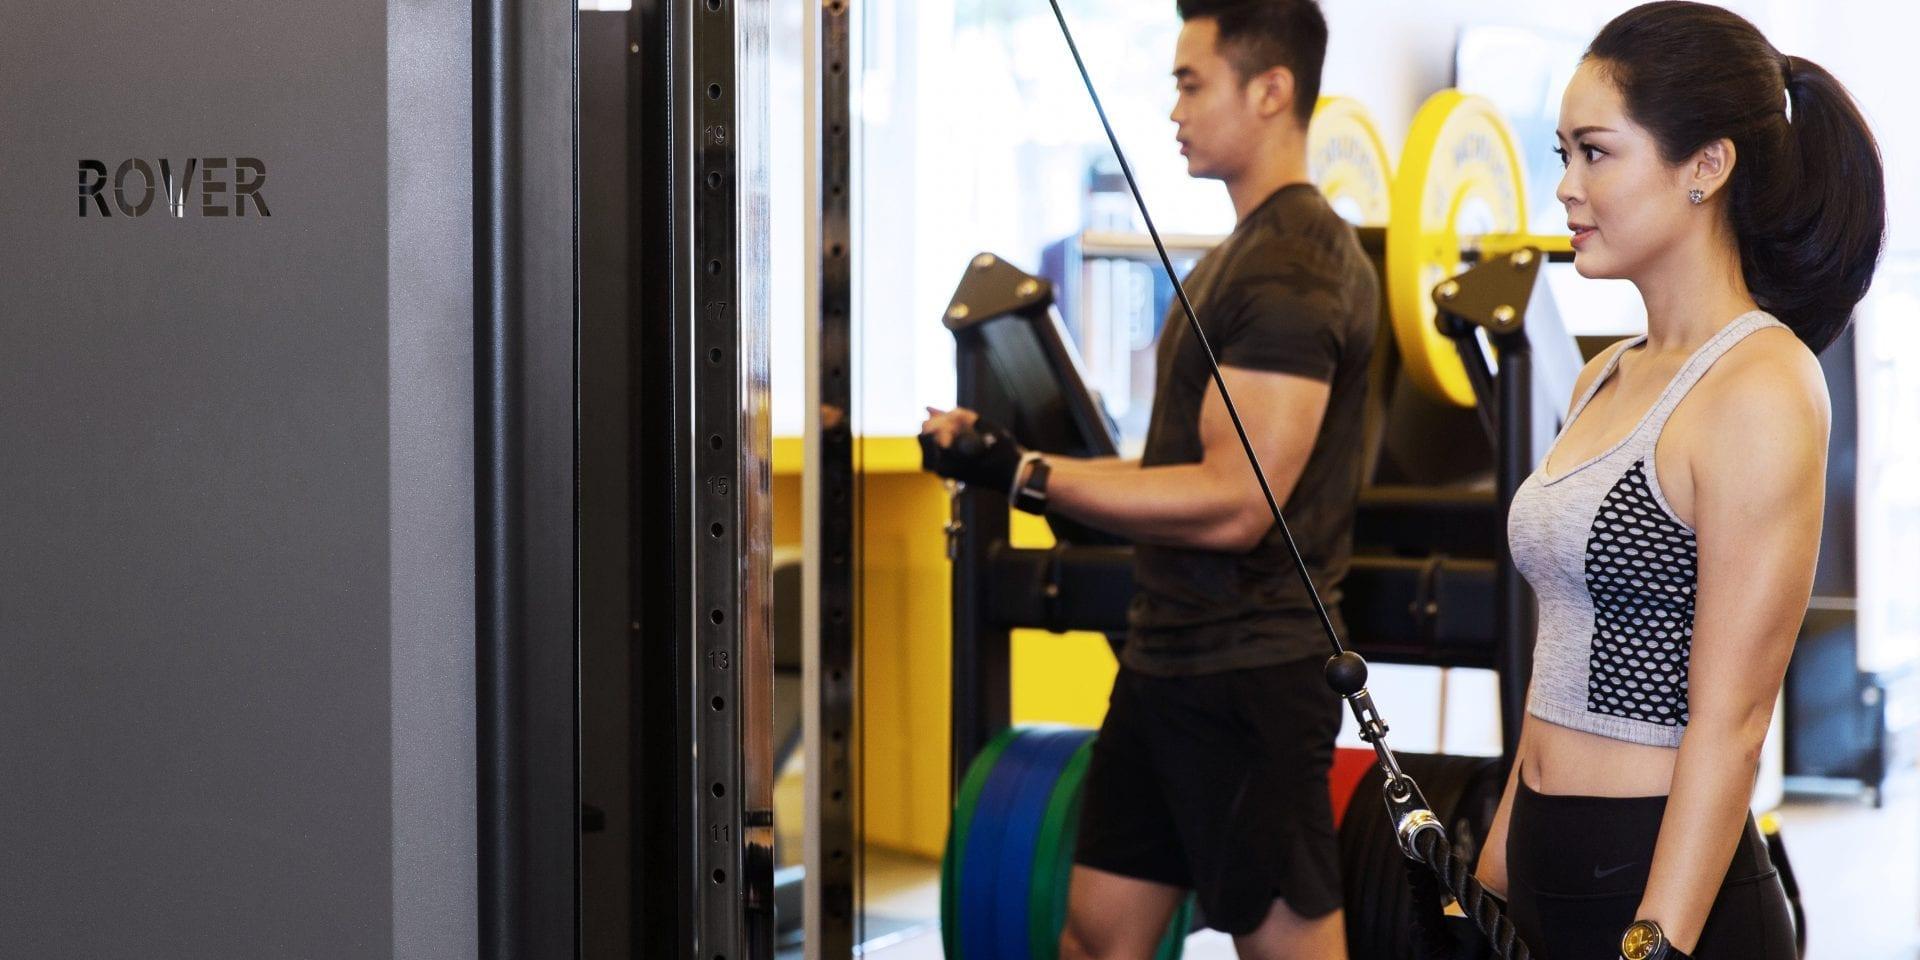 Refit fitness